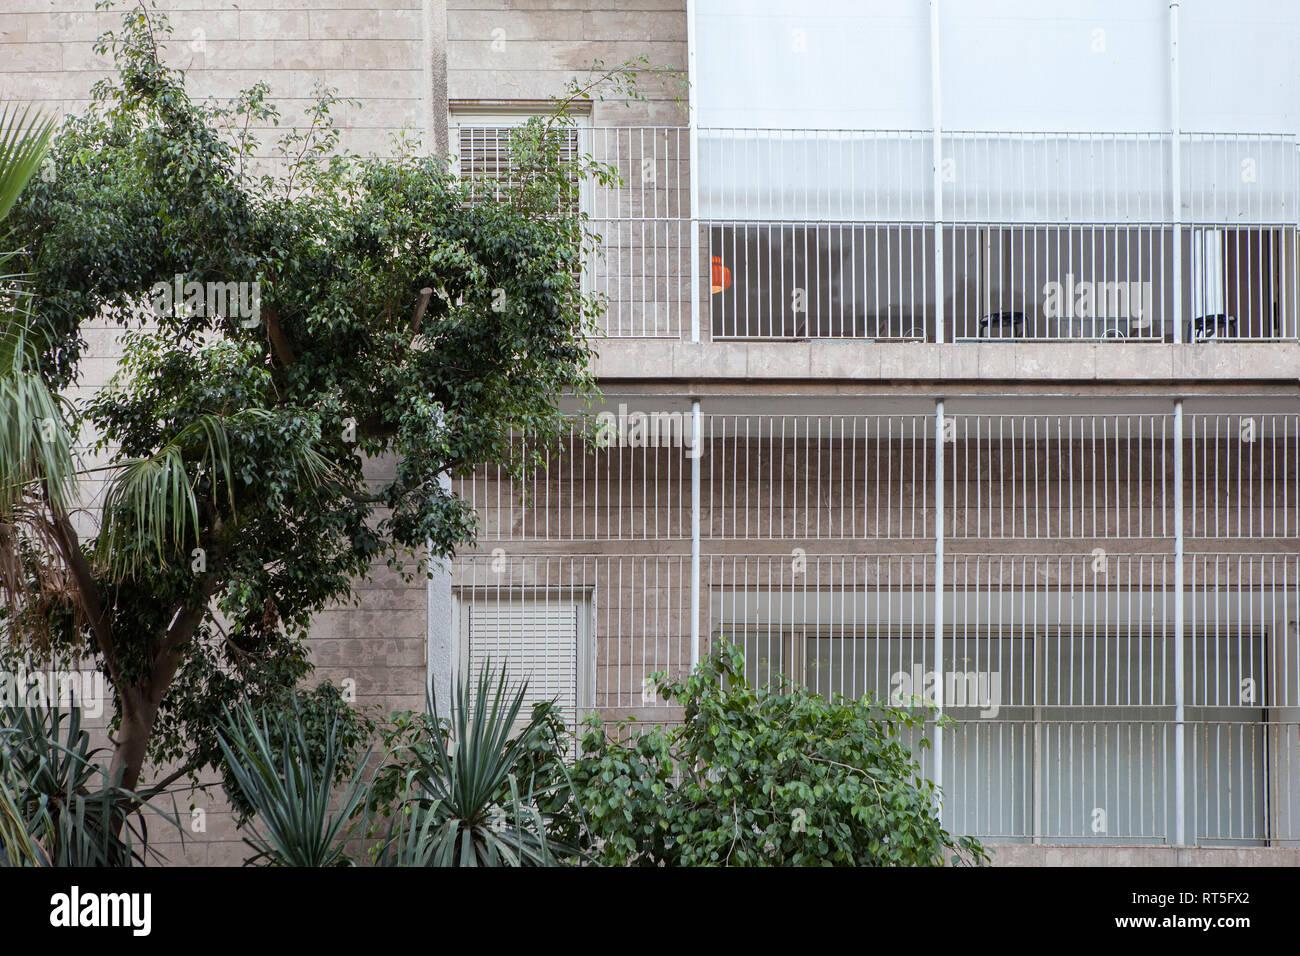 Israel, Tel Aviv, Rothschild Boulevard, White City, International Style - Stock Image